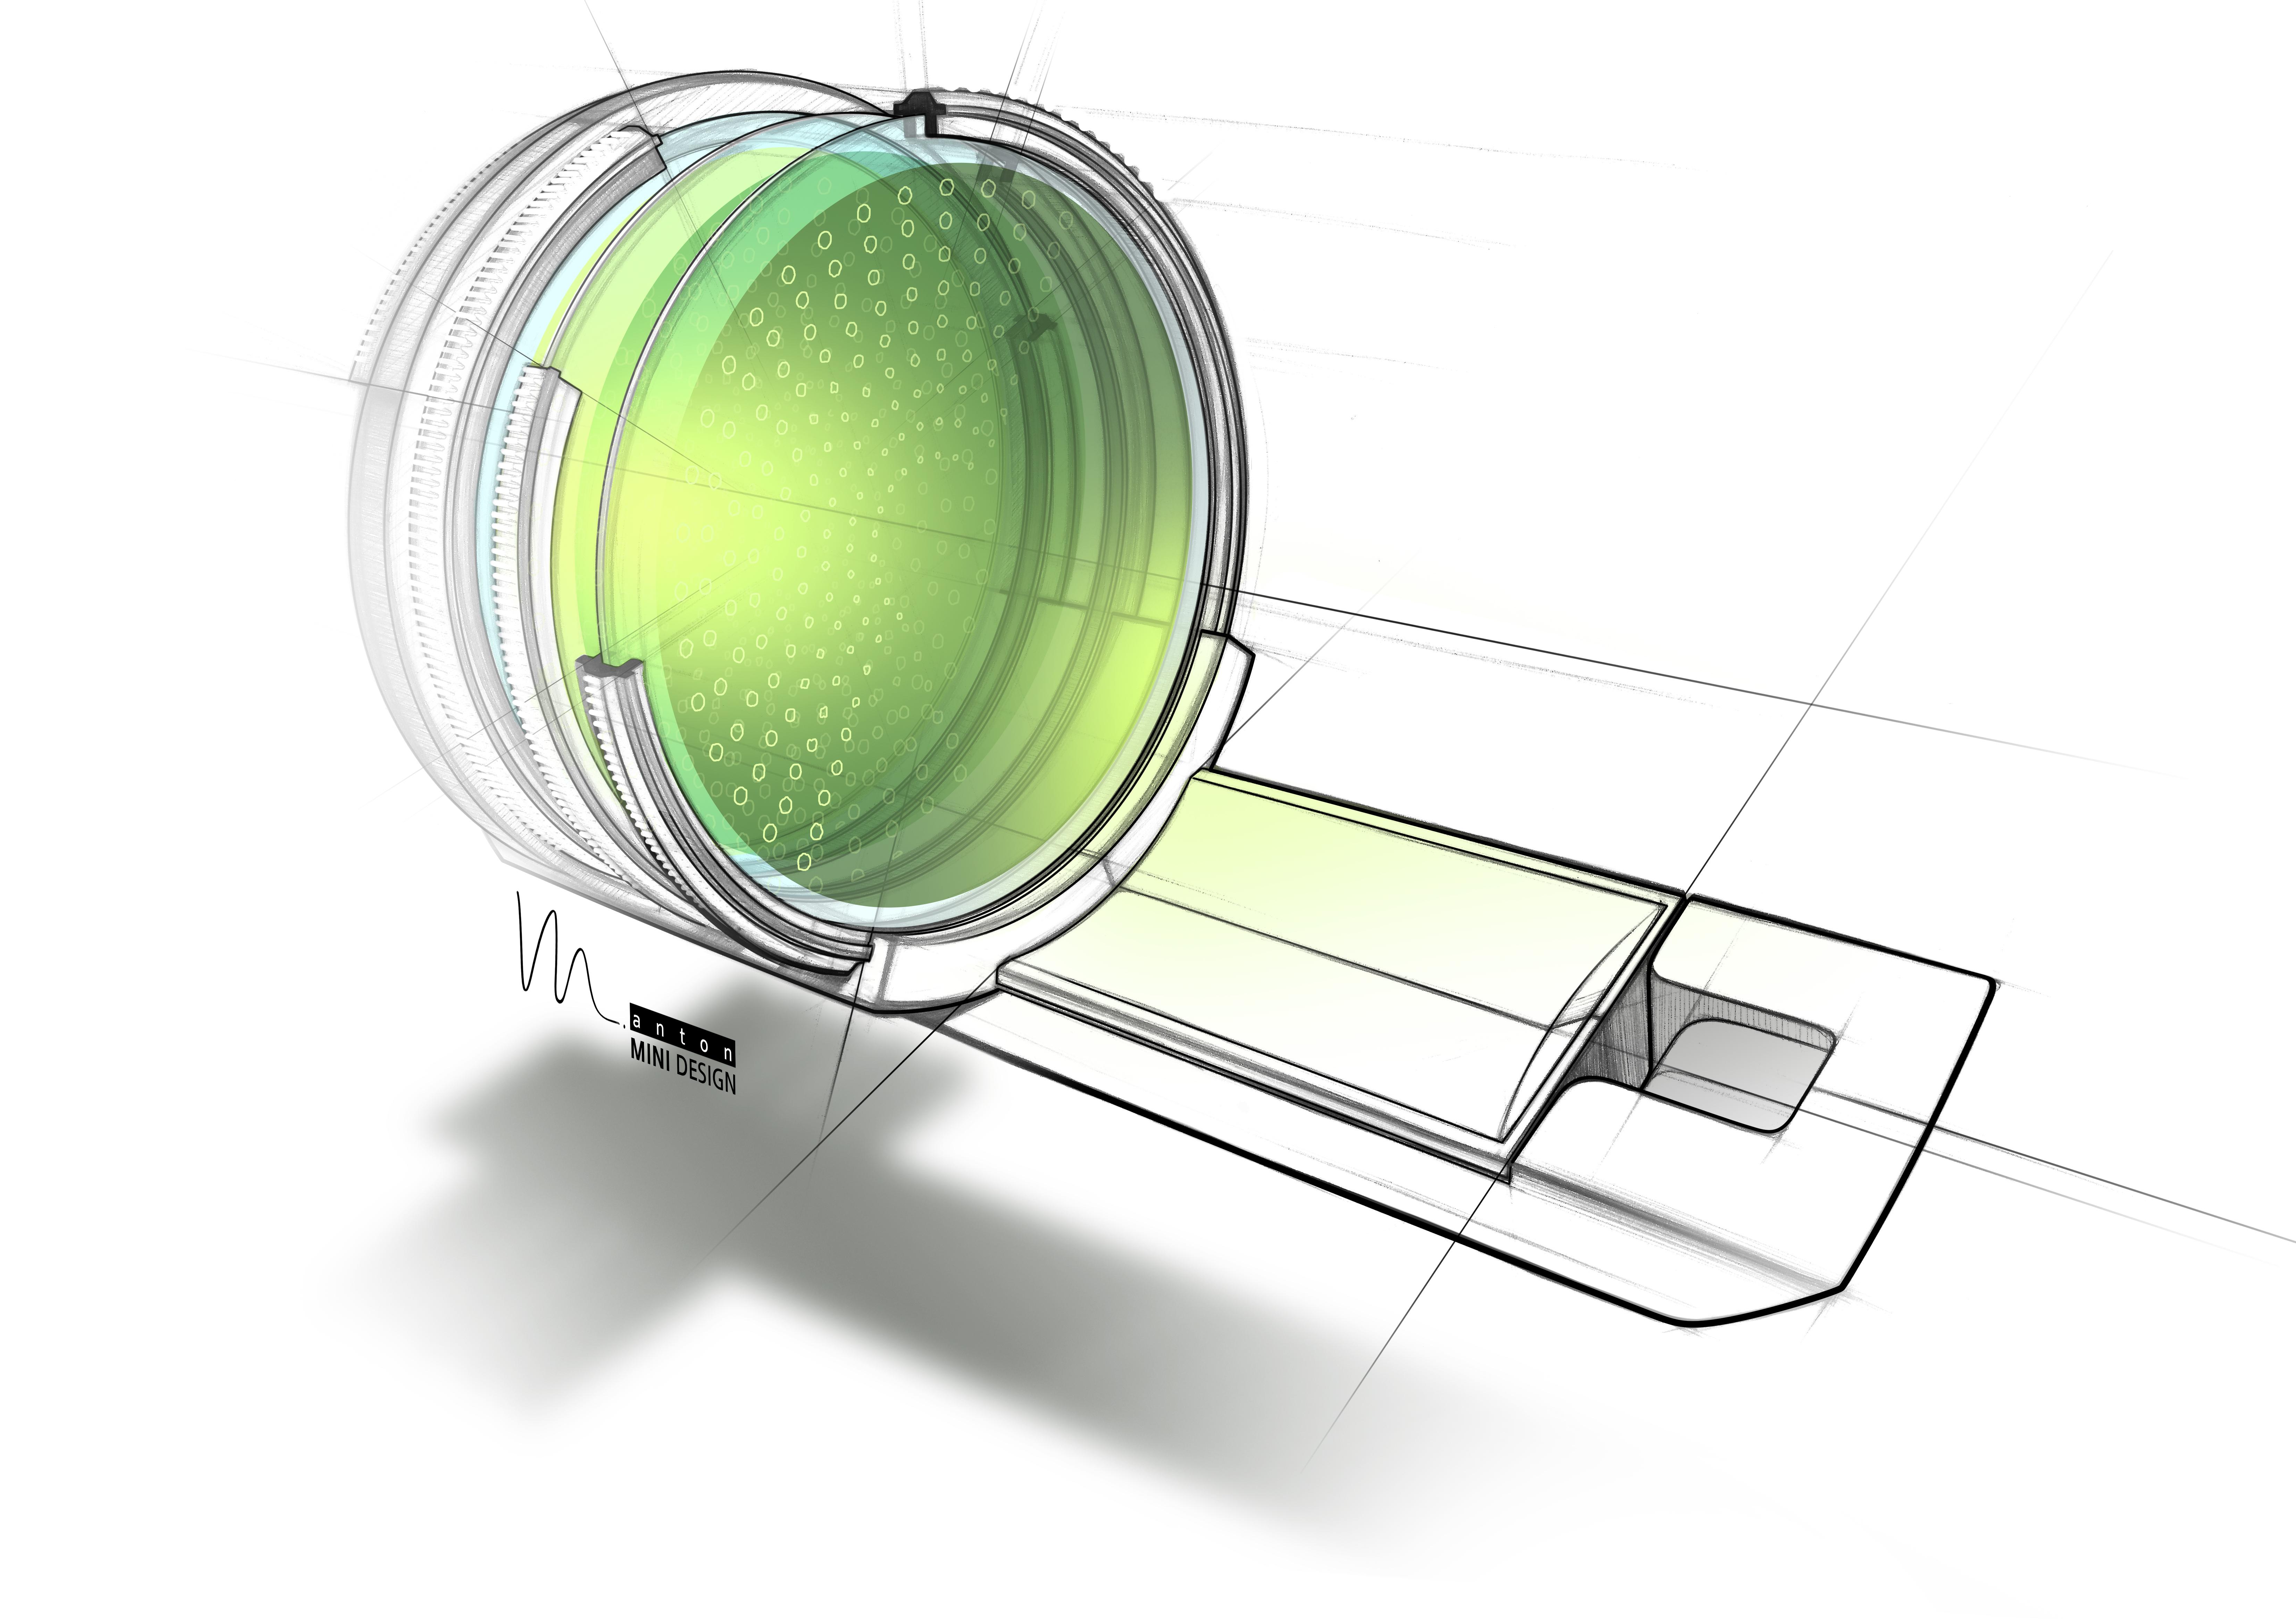 Hintergrundbilder : Illustration, Kugel, Kreis, Mini, Netcarshow ...